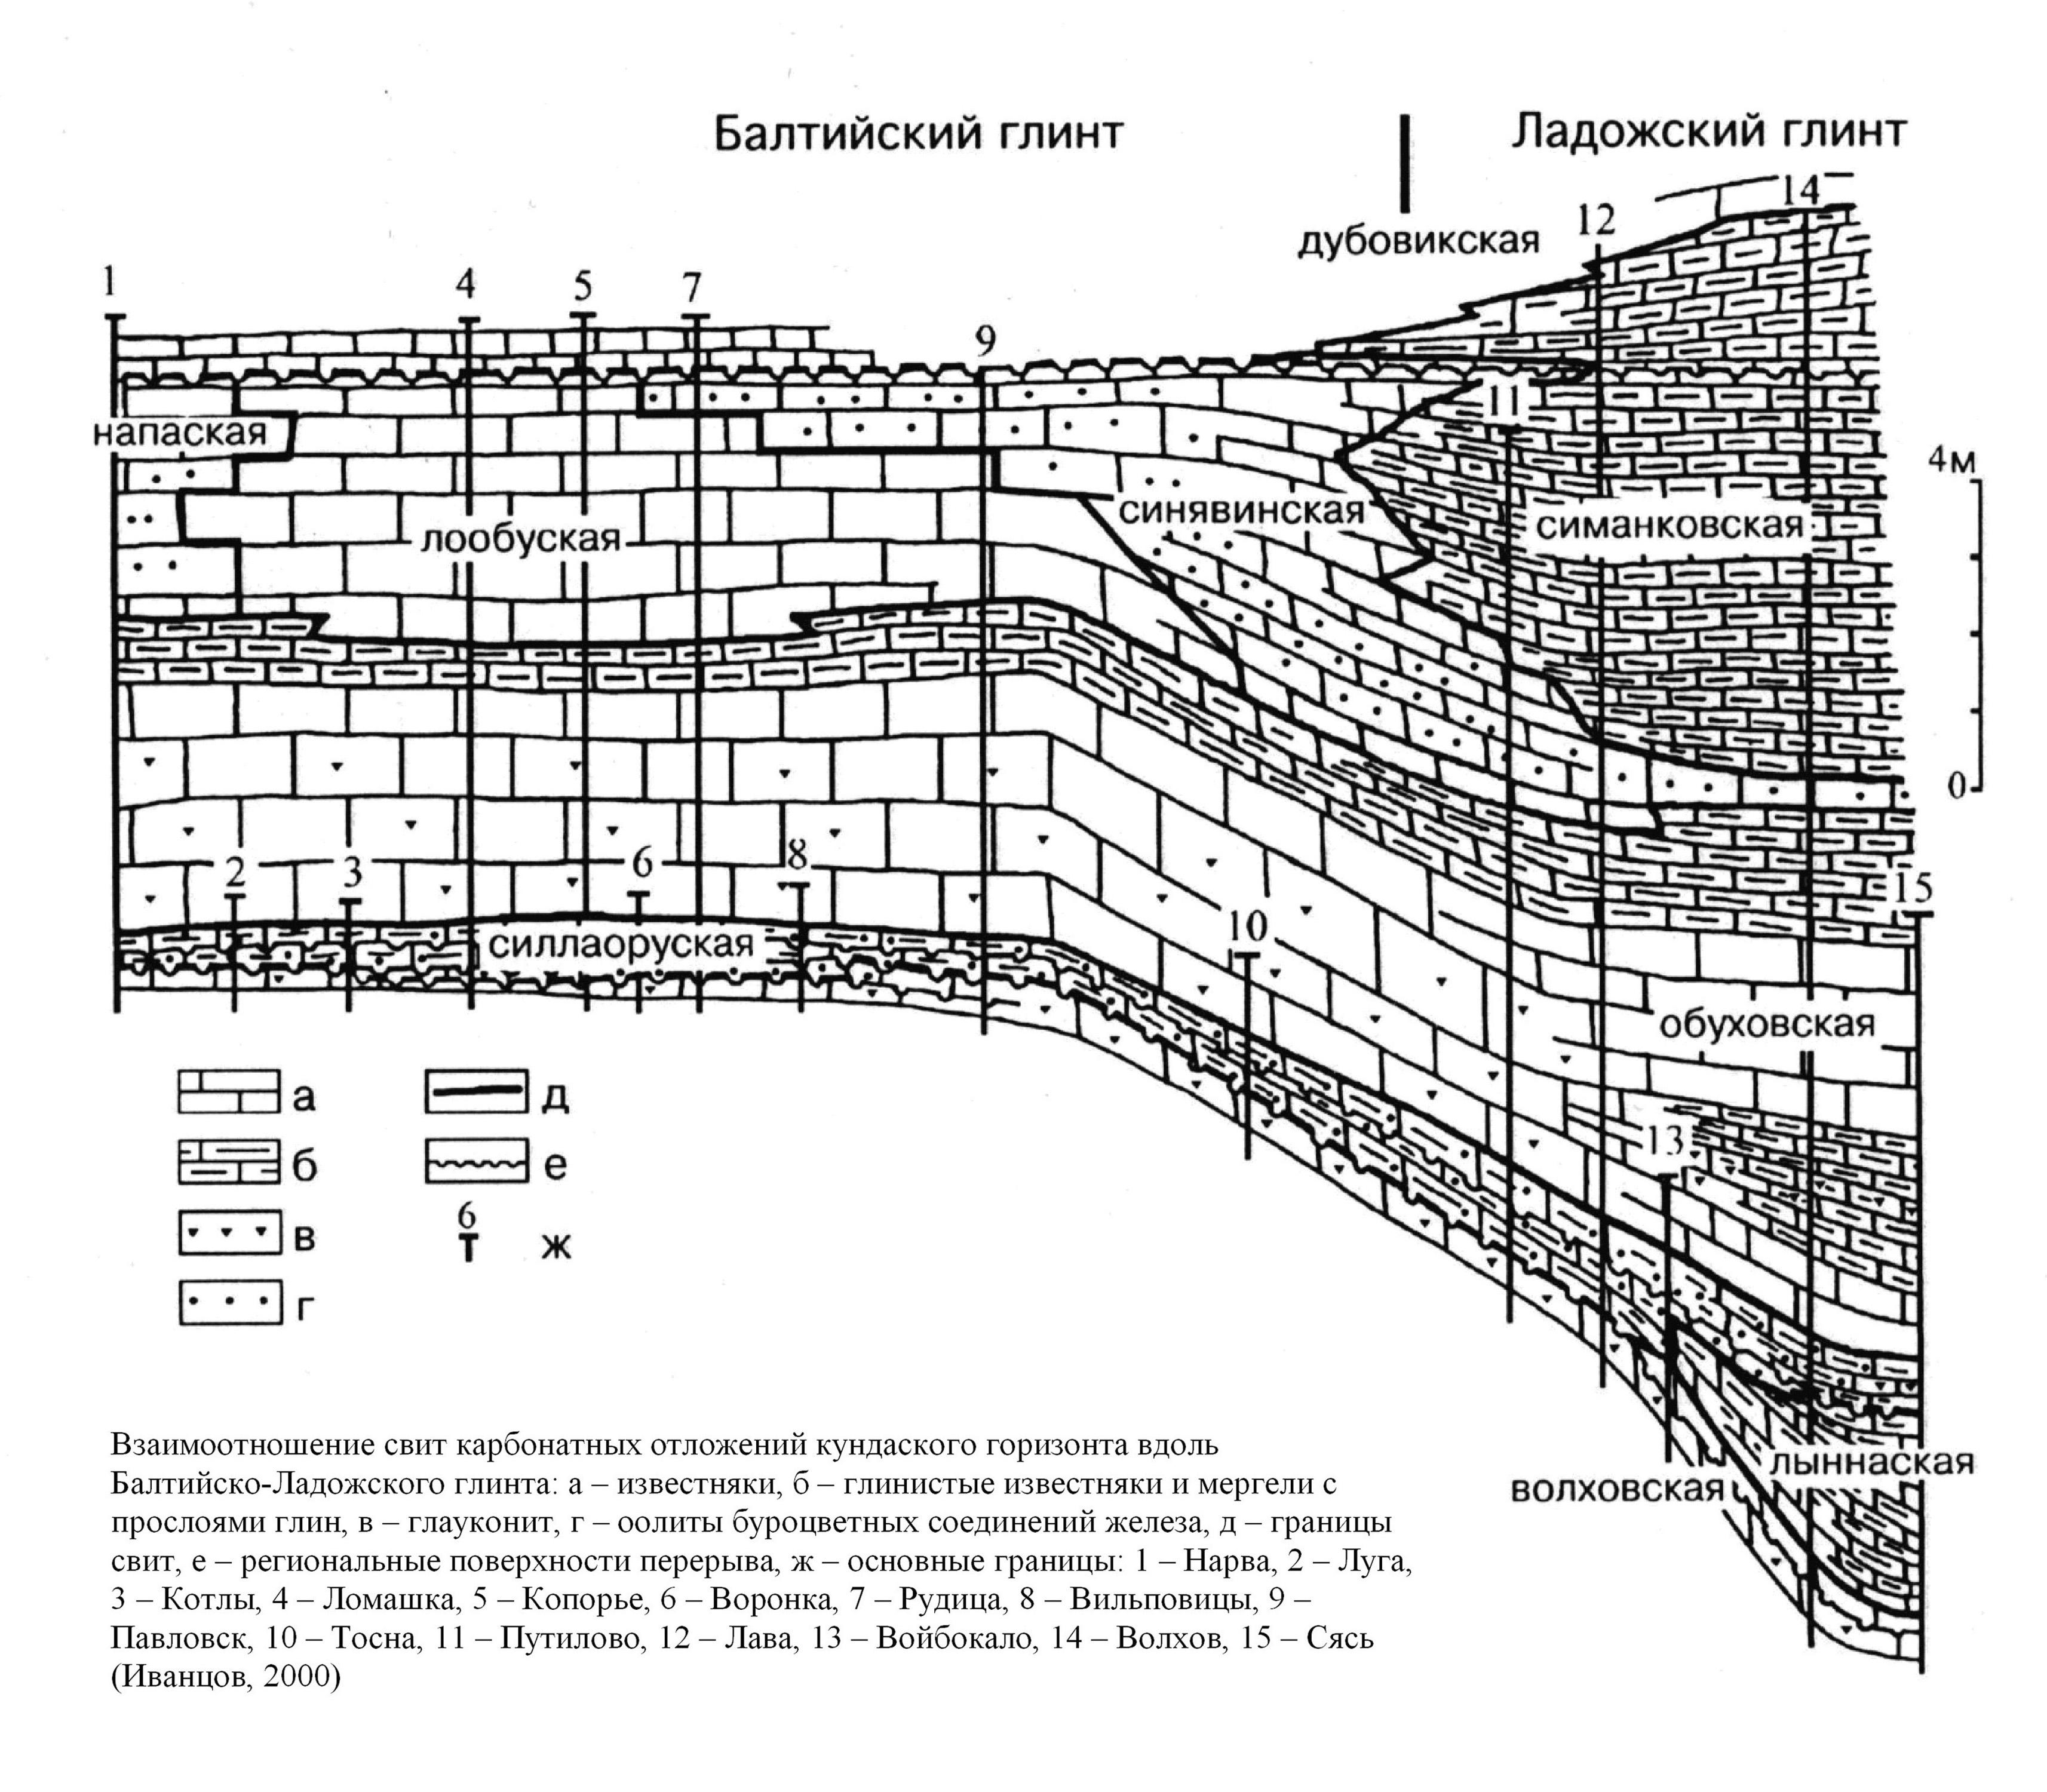 У�ебн�е коллек�ии Геология о�довика Бал�о�кандии